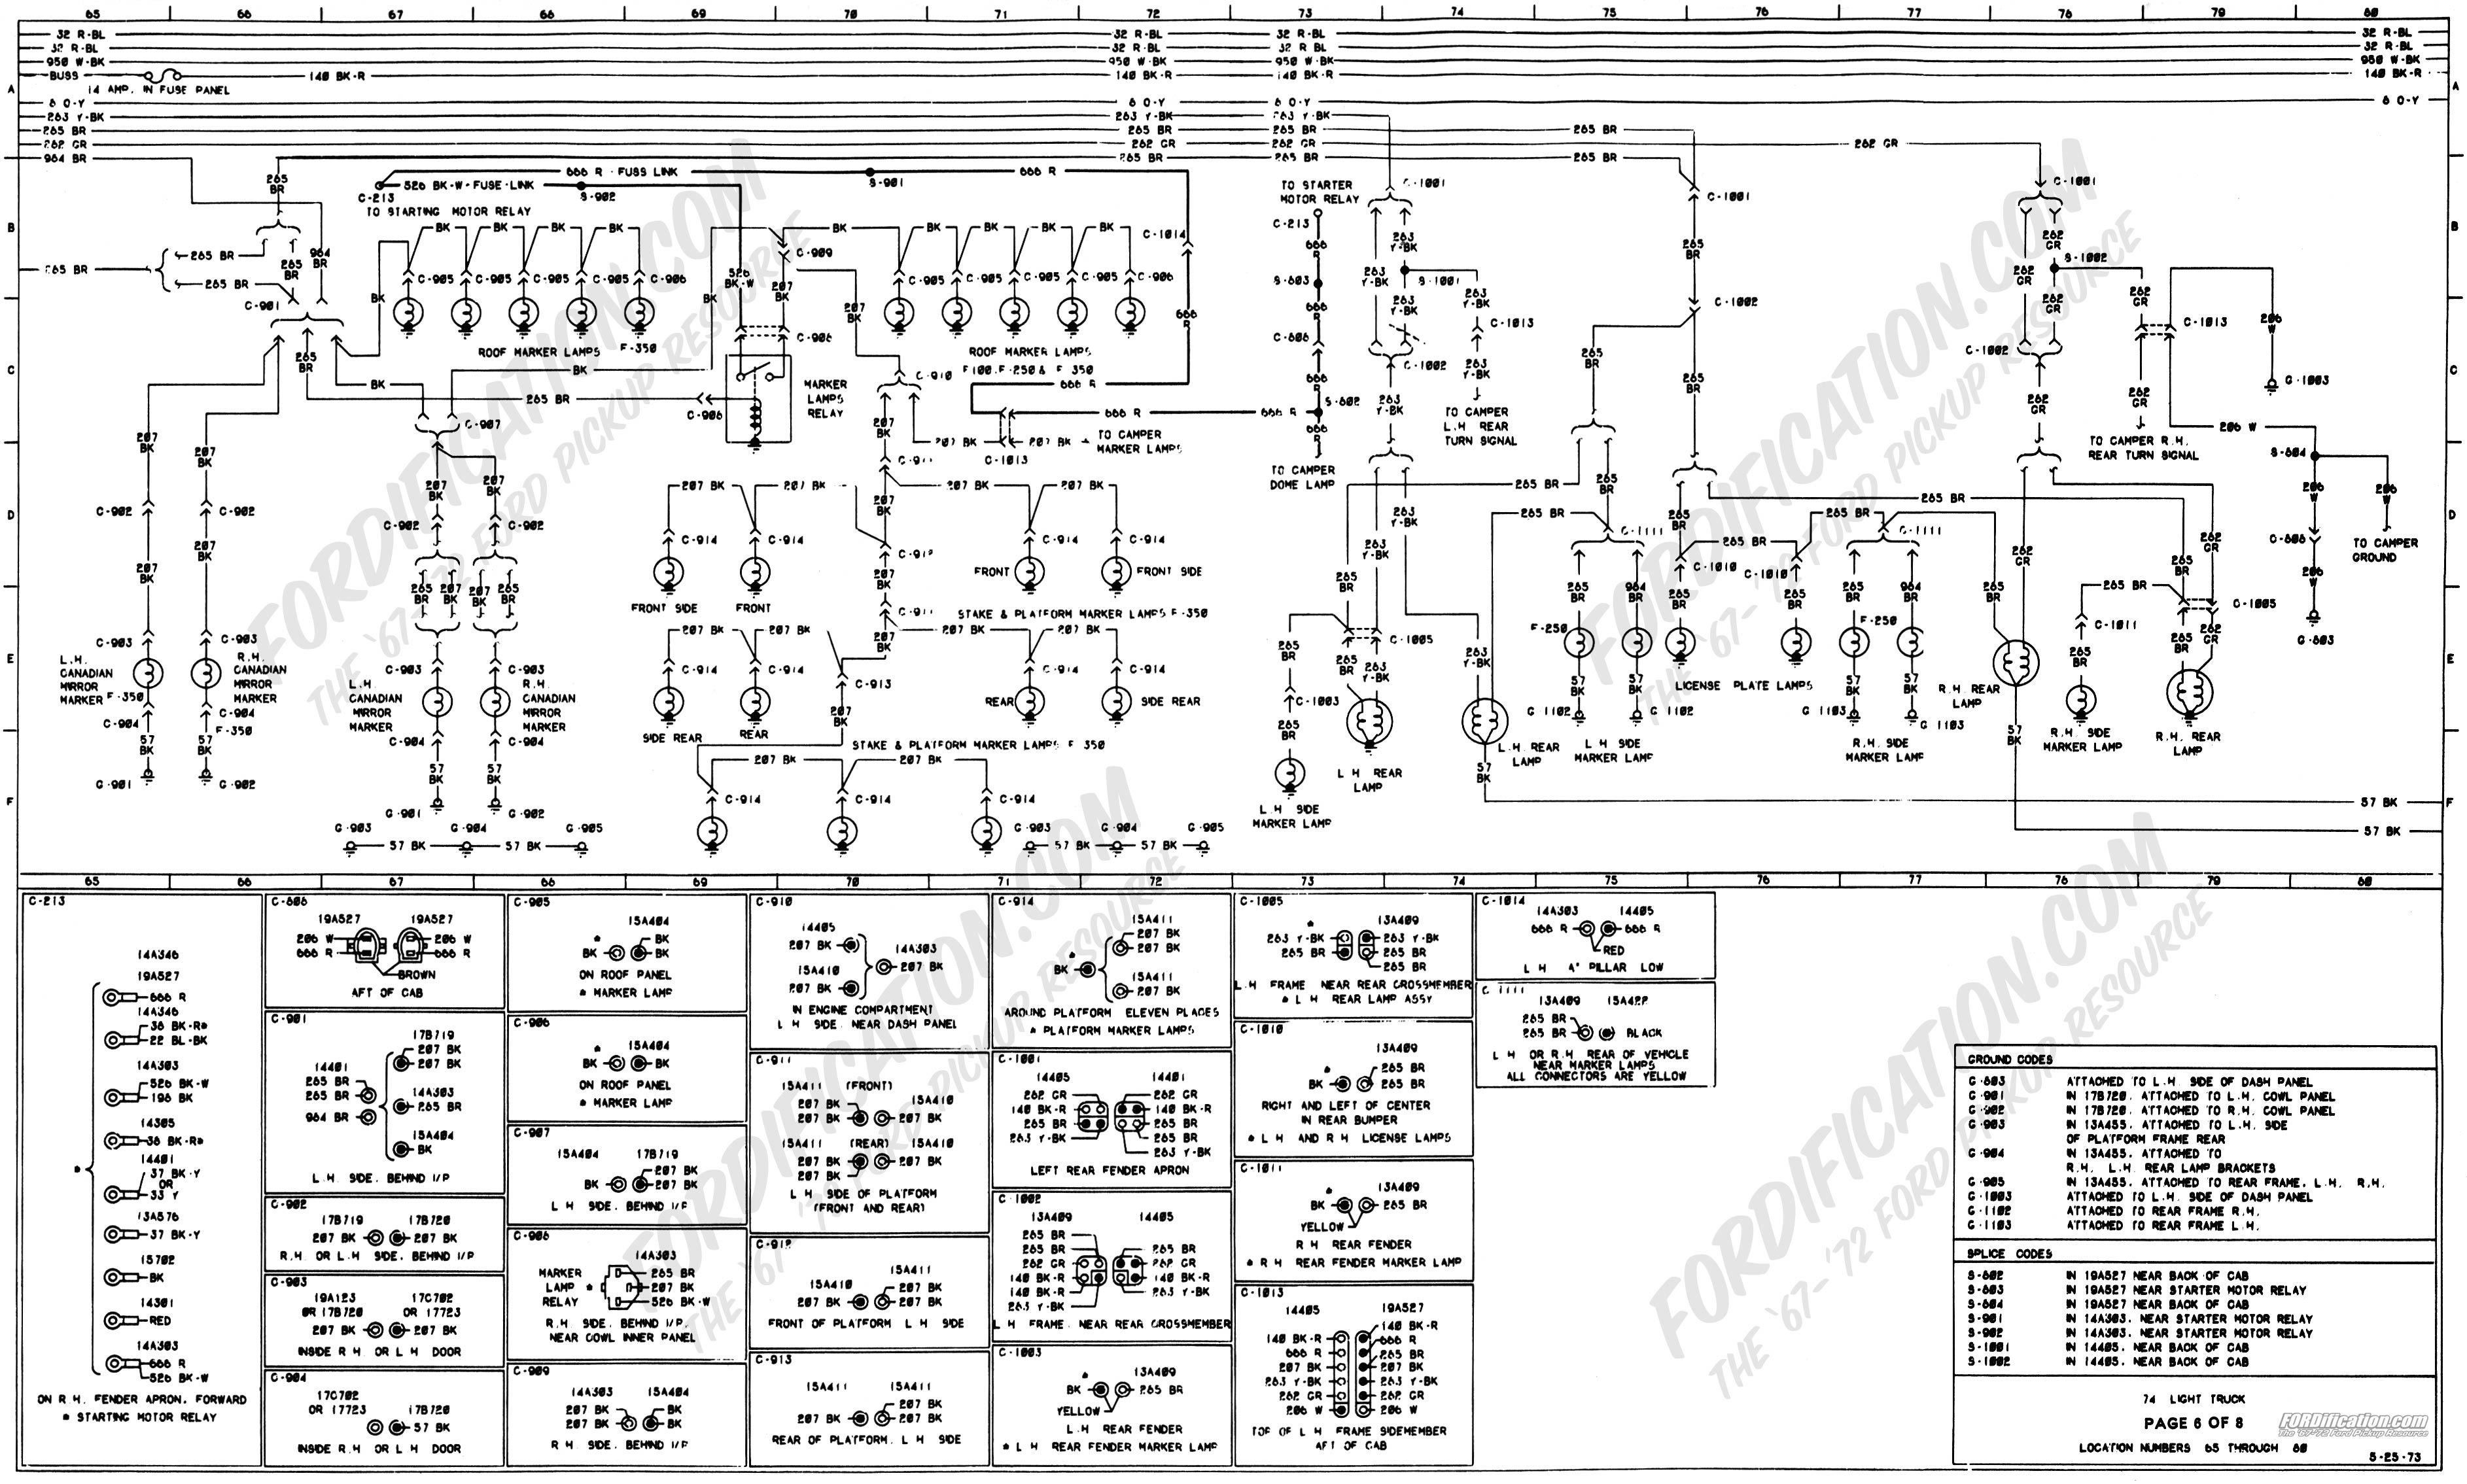 81 Ford F100 Wiring Diagram - Wiring Diagram Data Oreo - Ford F250 Wiring Diagram